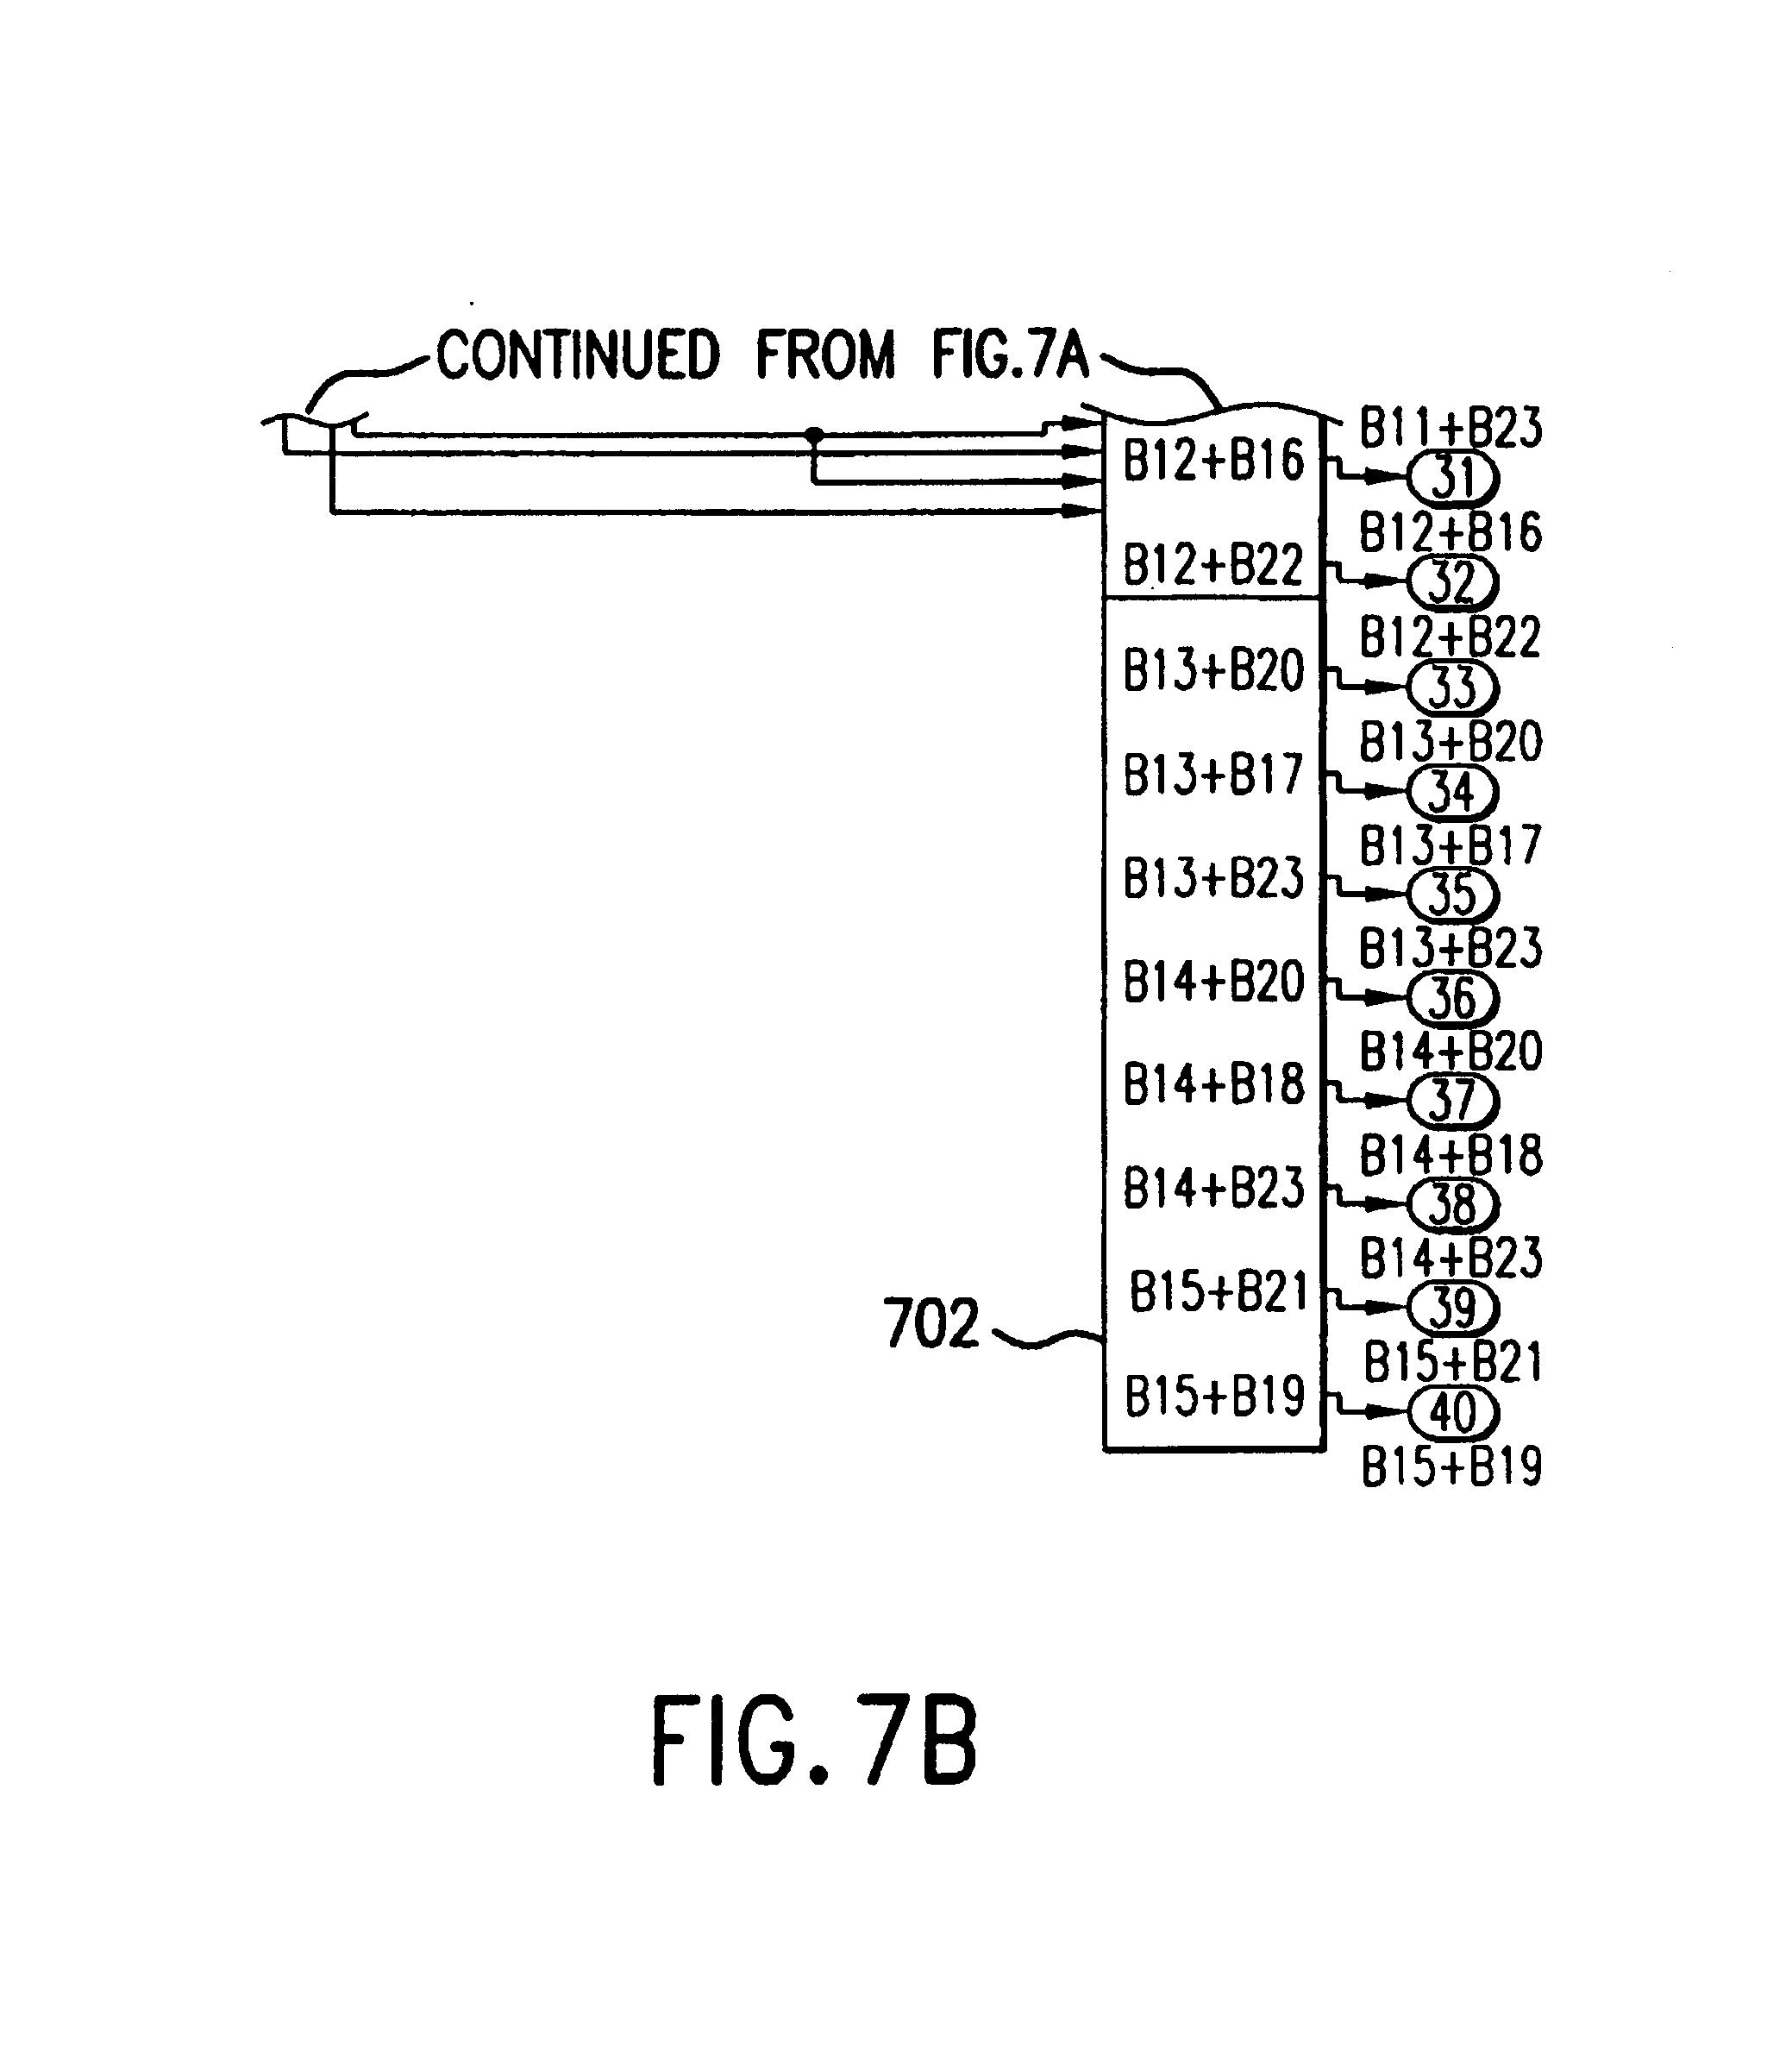 Patent US 7,010,559 B2